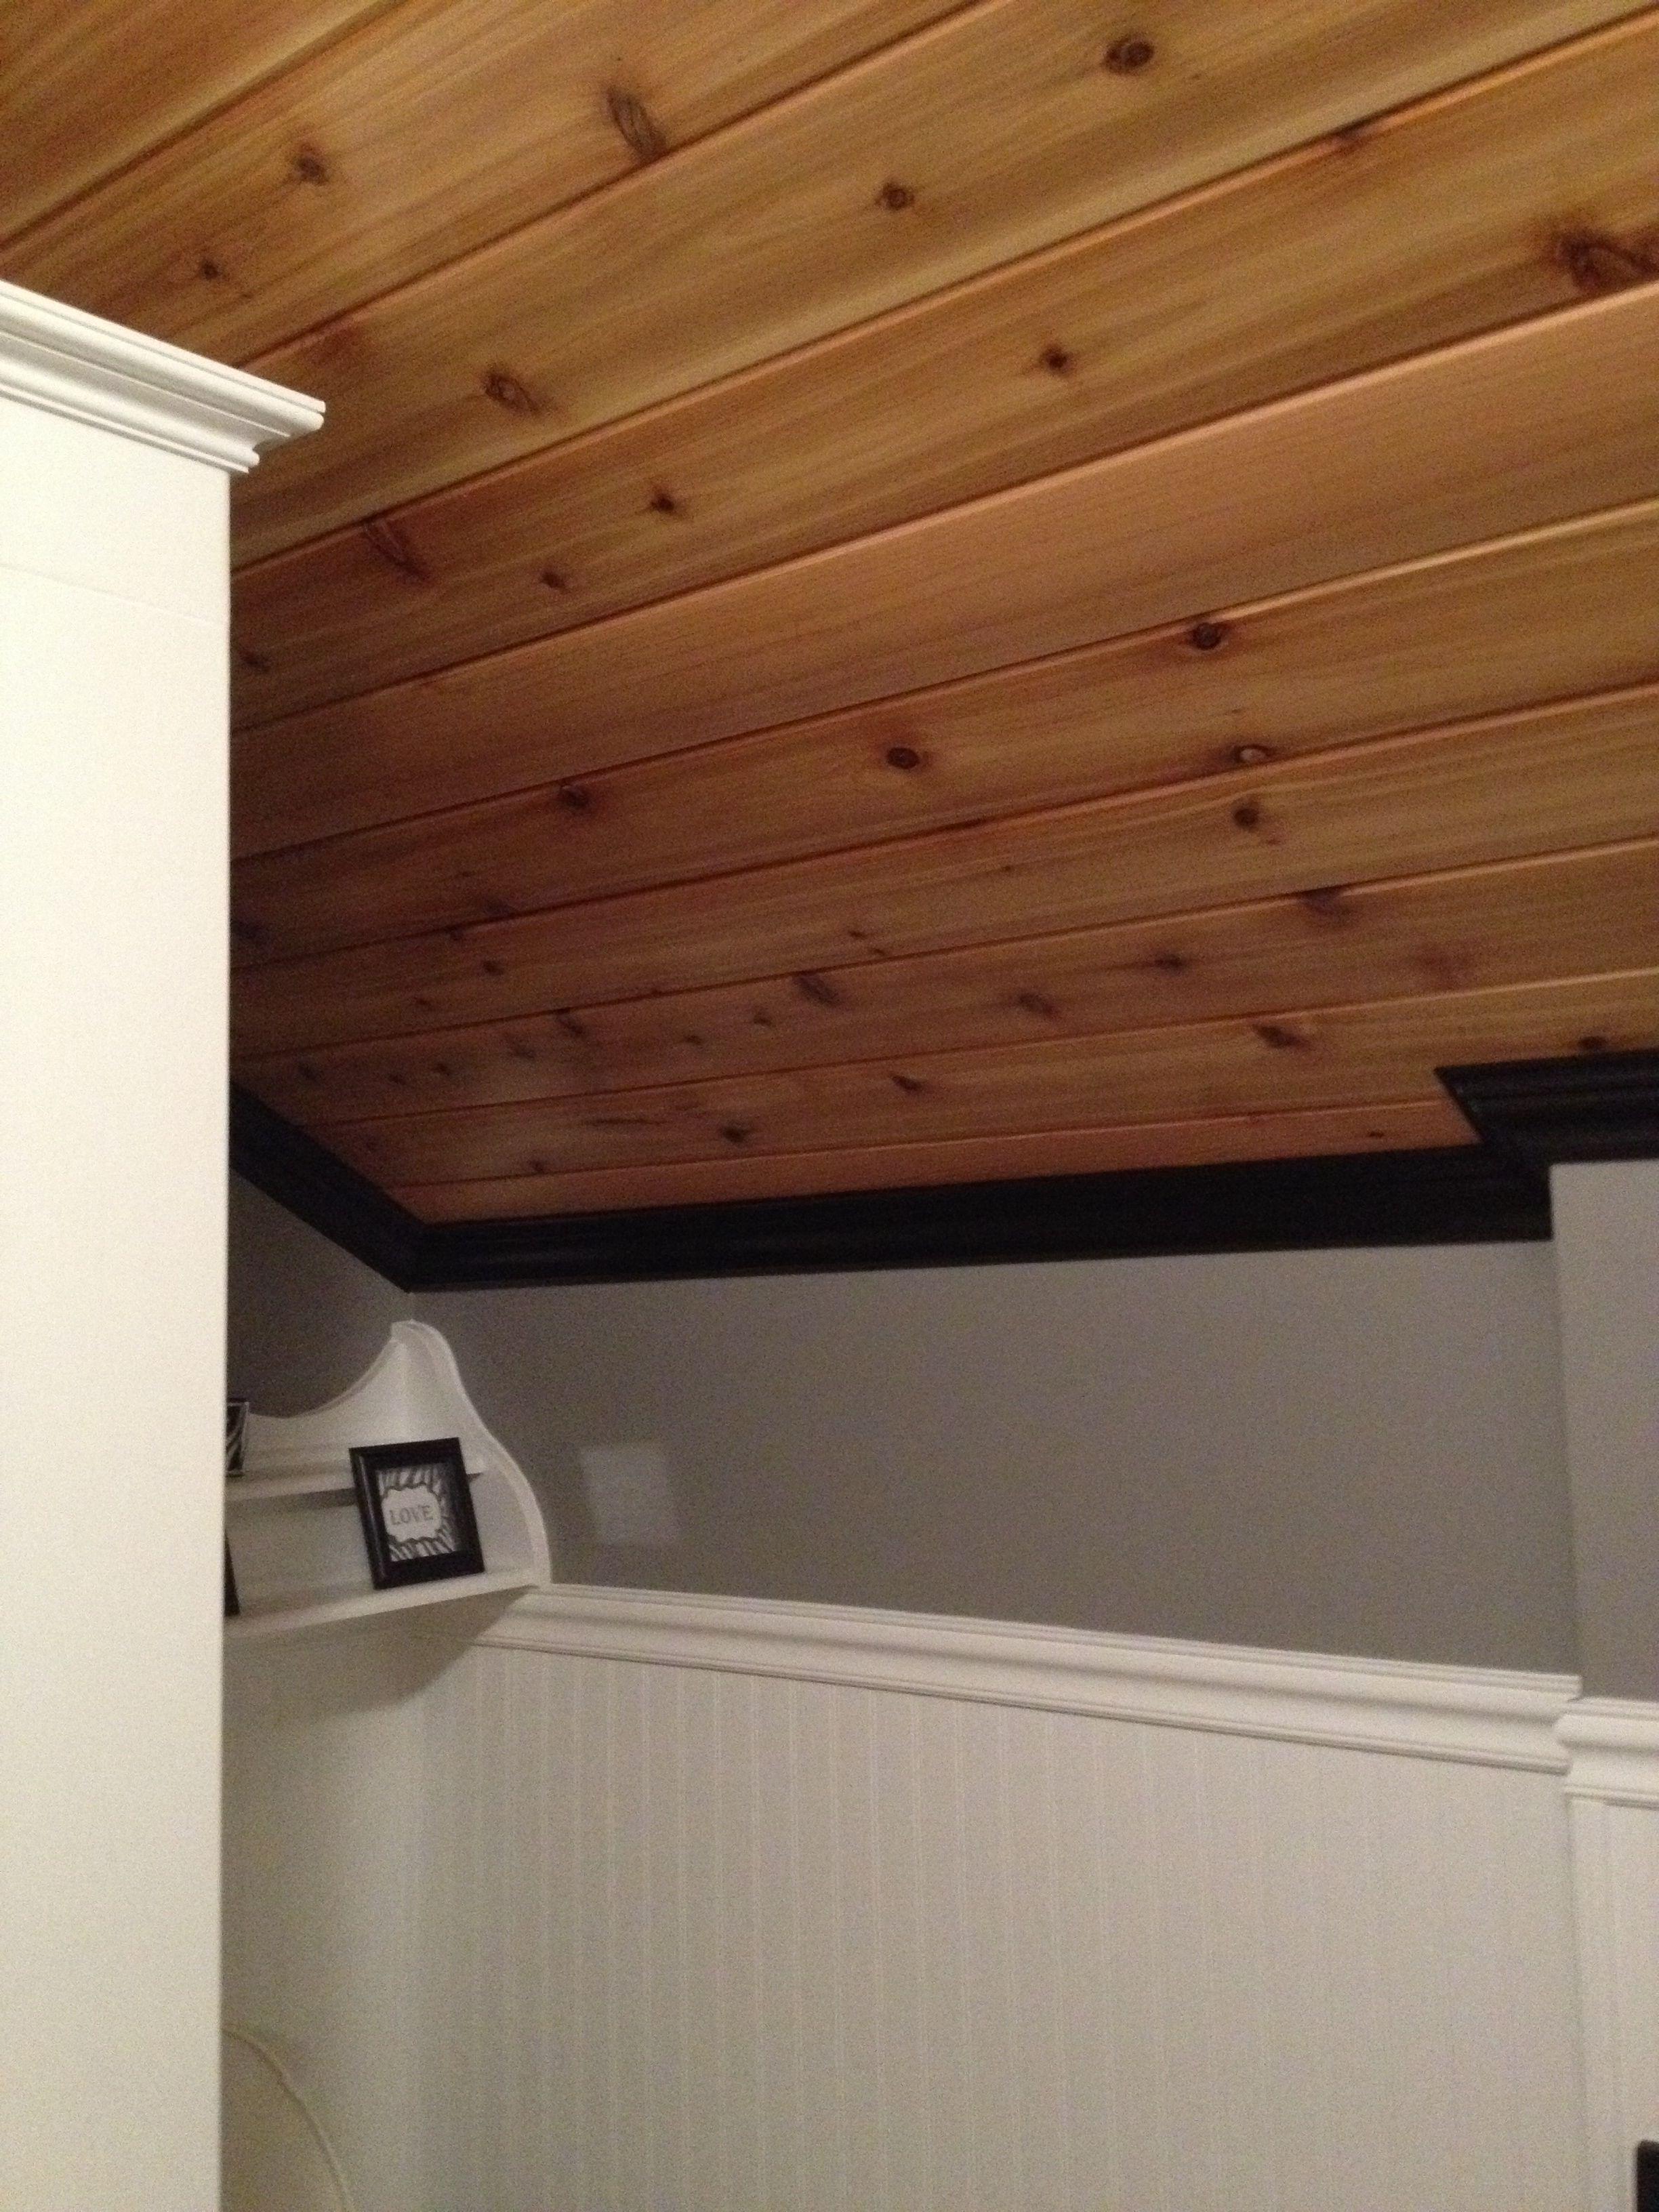 Cedar ceiling with crown molding my bathroom remodel for Bathroom ceiling molding ideas